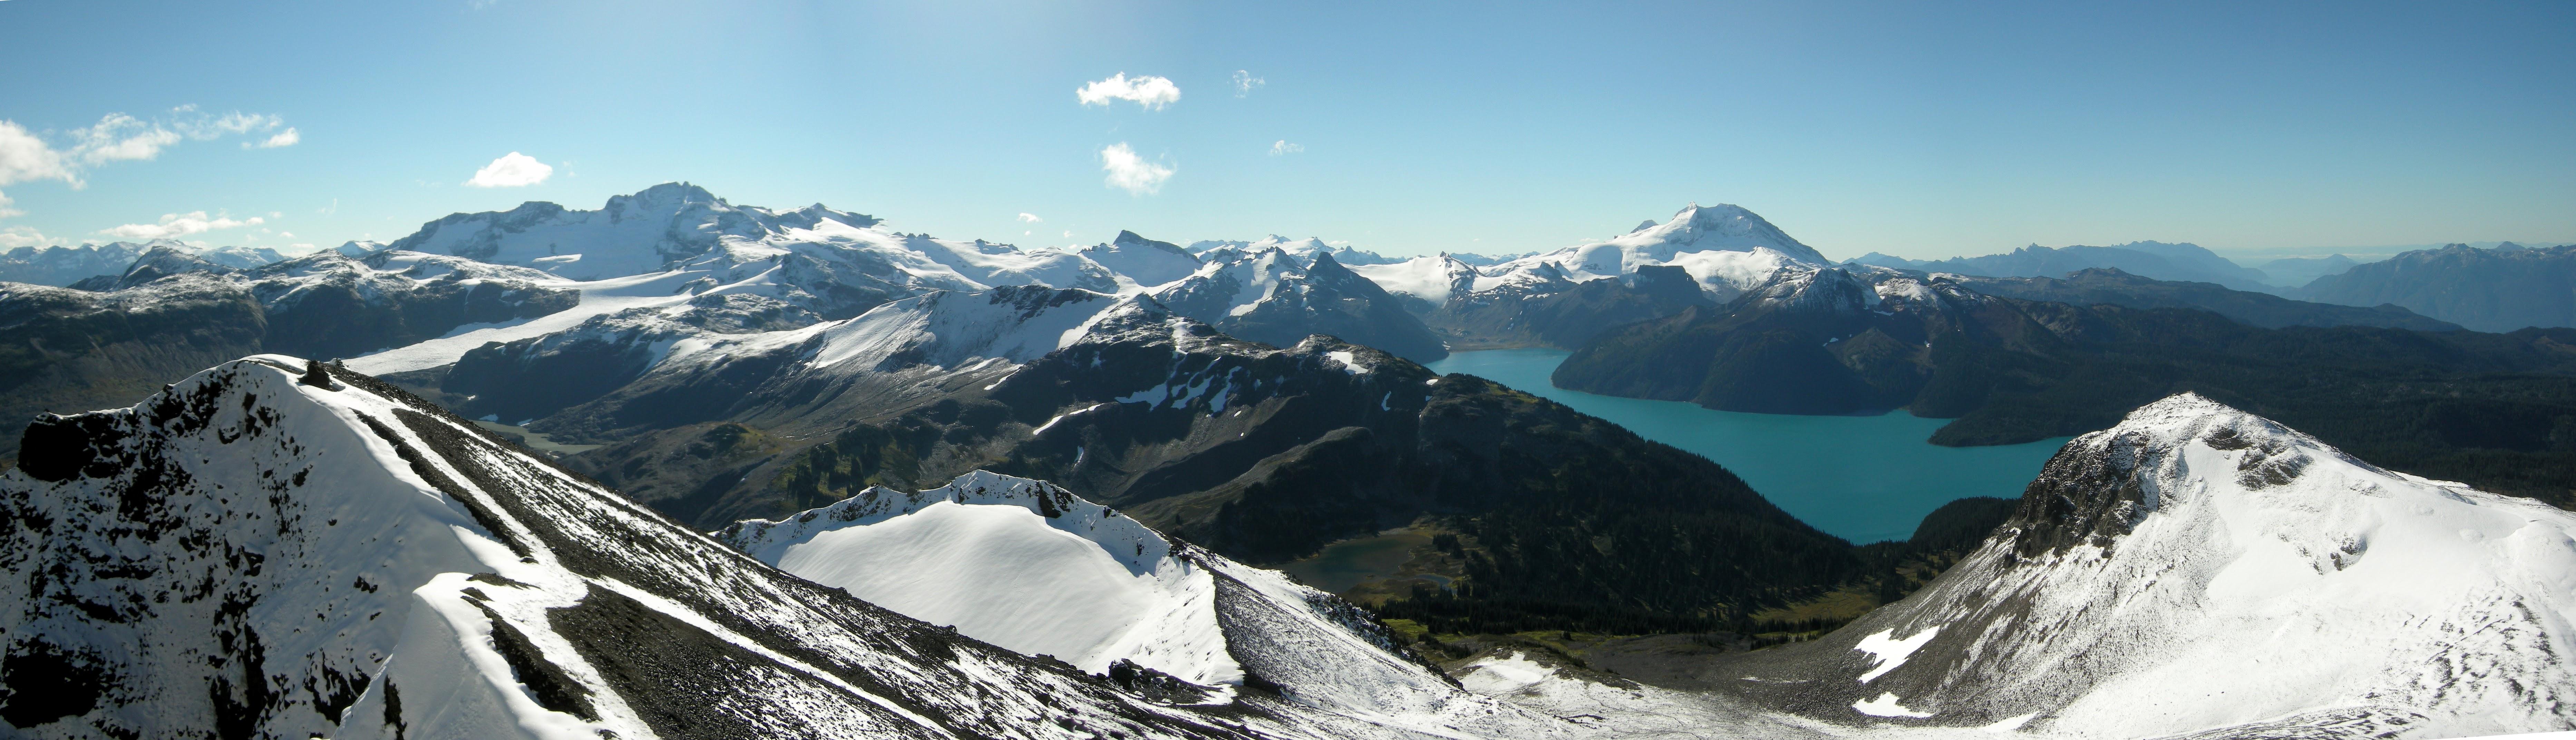 Great views from Black Tusk. photo G. Savard